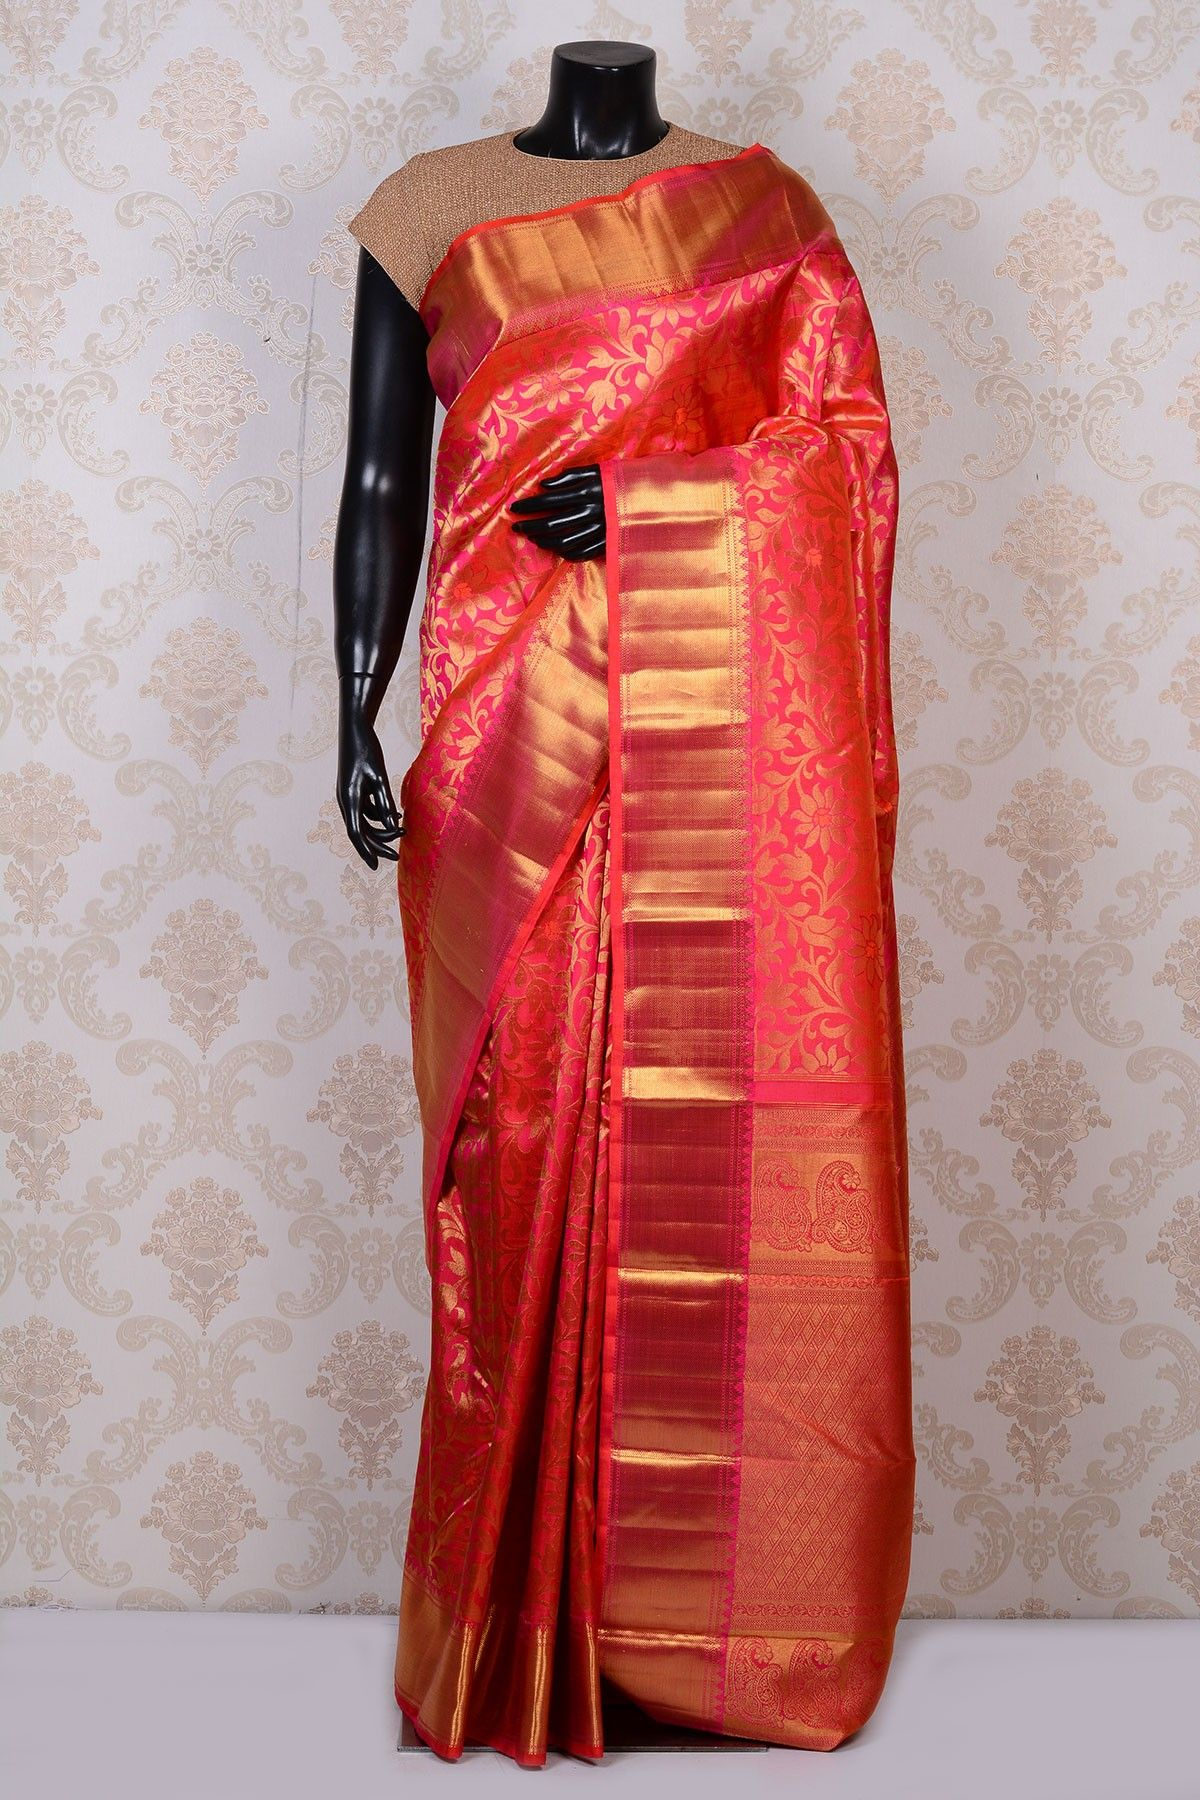 2ff591d110 Hot pink lovely kanchipuram silk saree with gold border-SR17199 - Pure  Kanchipuram Real Zari - PURE HANDLOOM SILK SAREE - Sarees